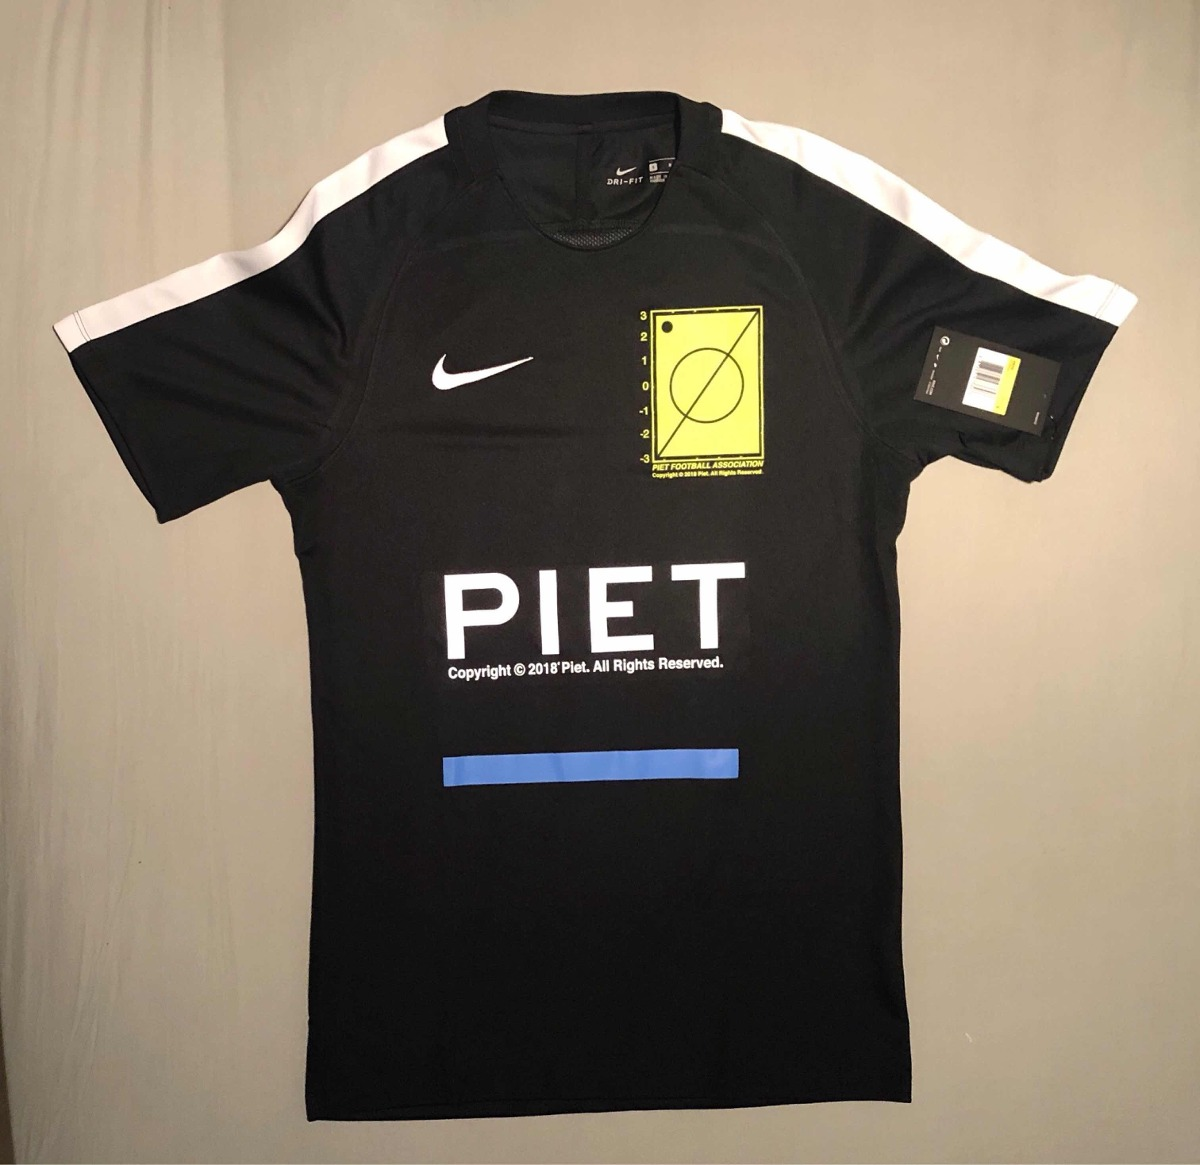 camiseta nike piet football association. Carregando zoom. ac83324250b36